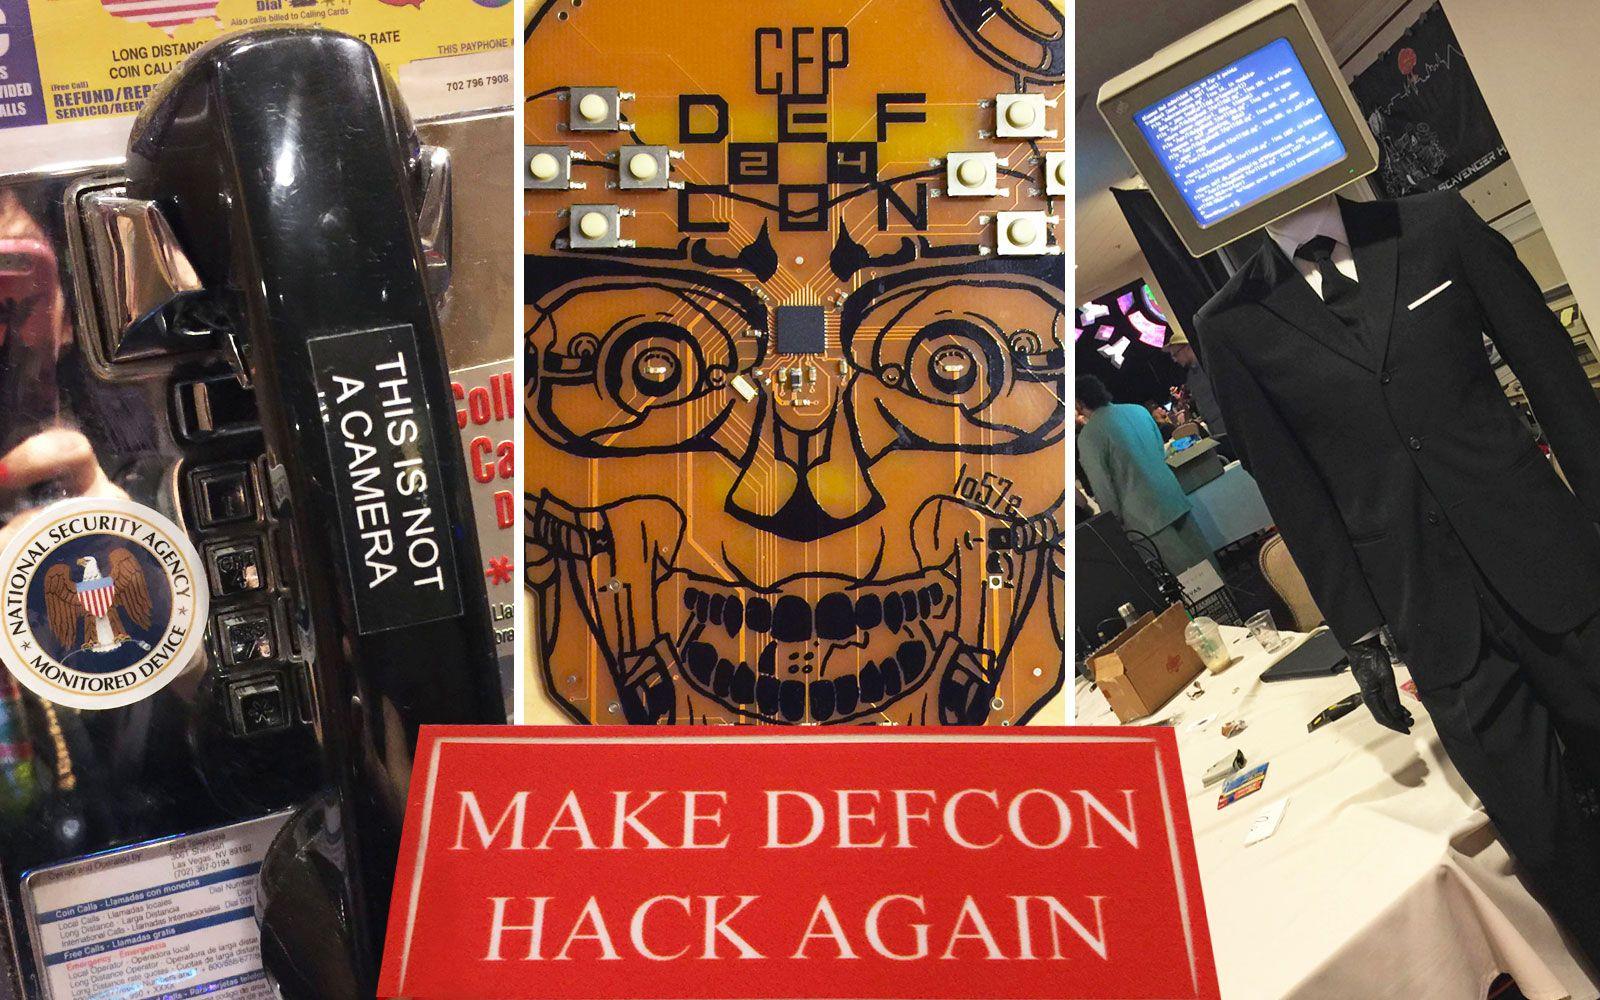 The hysterical hacking headlines of Def Con 24 Def con